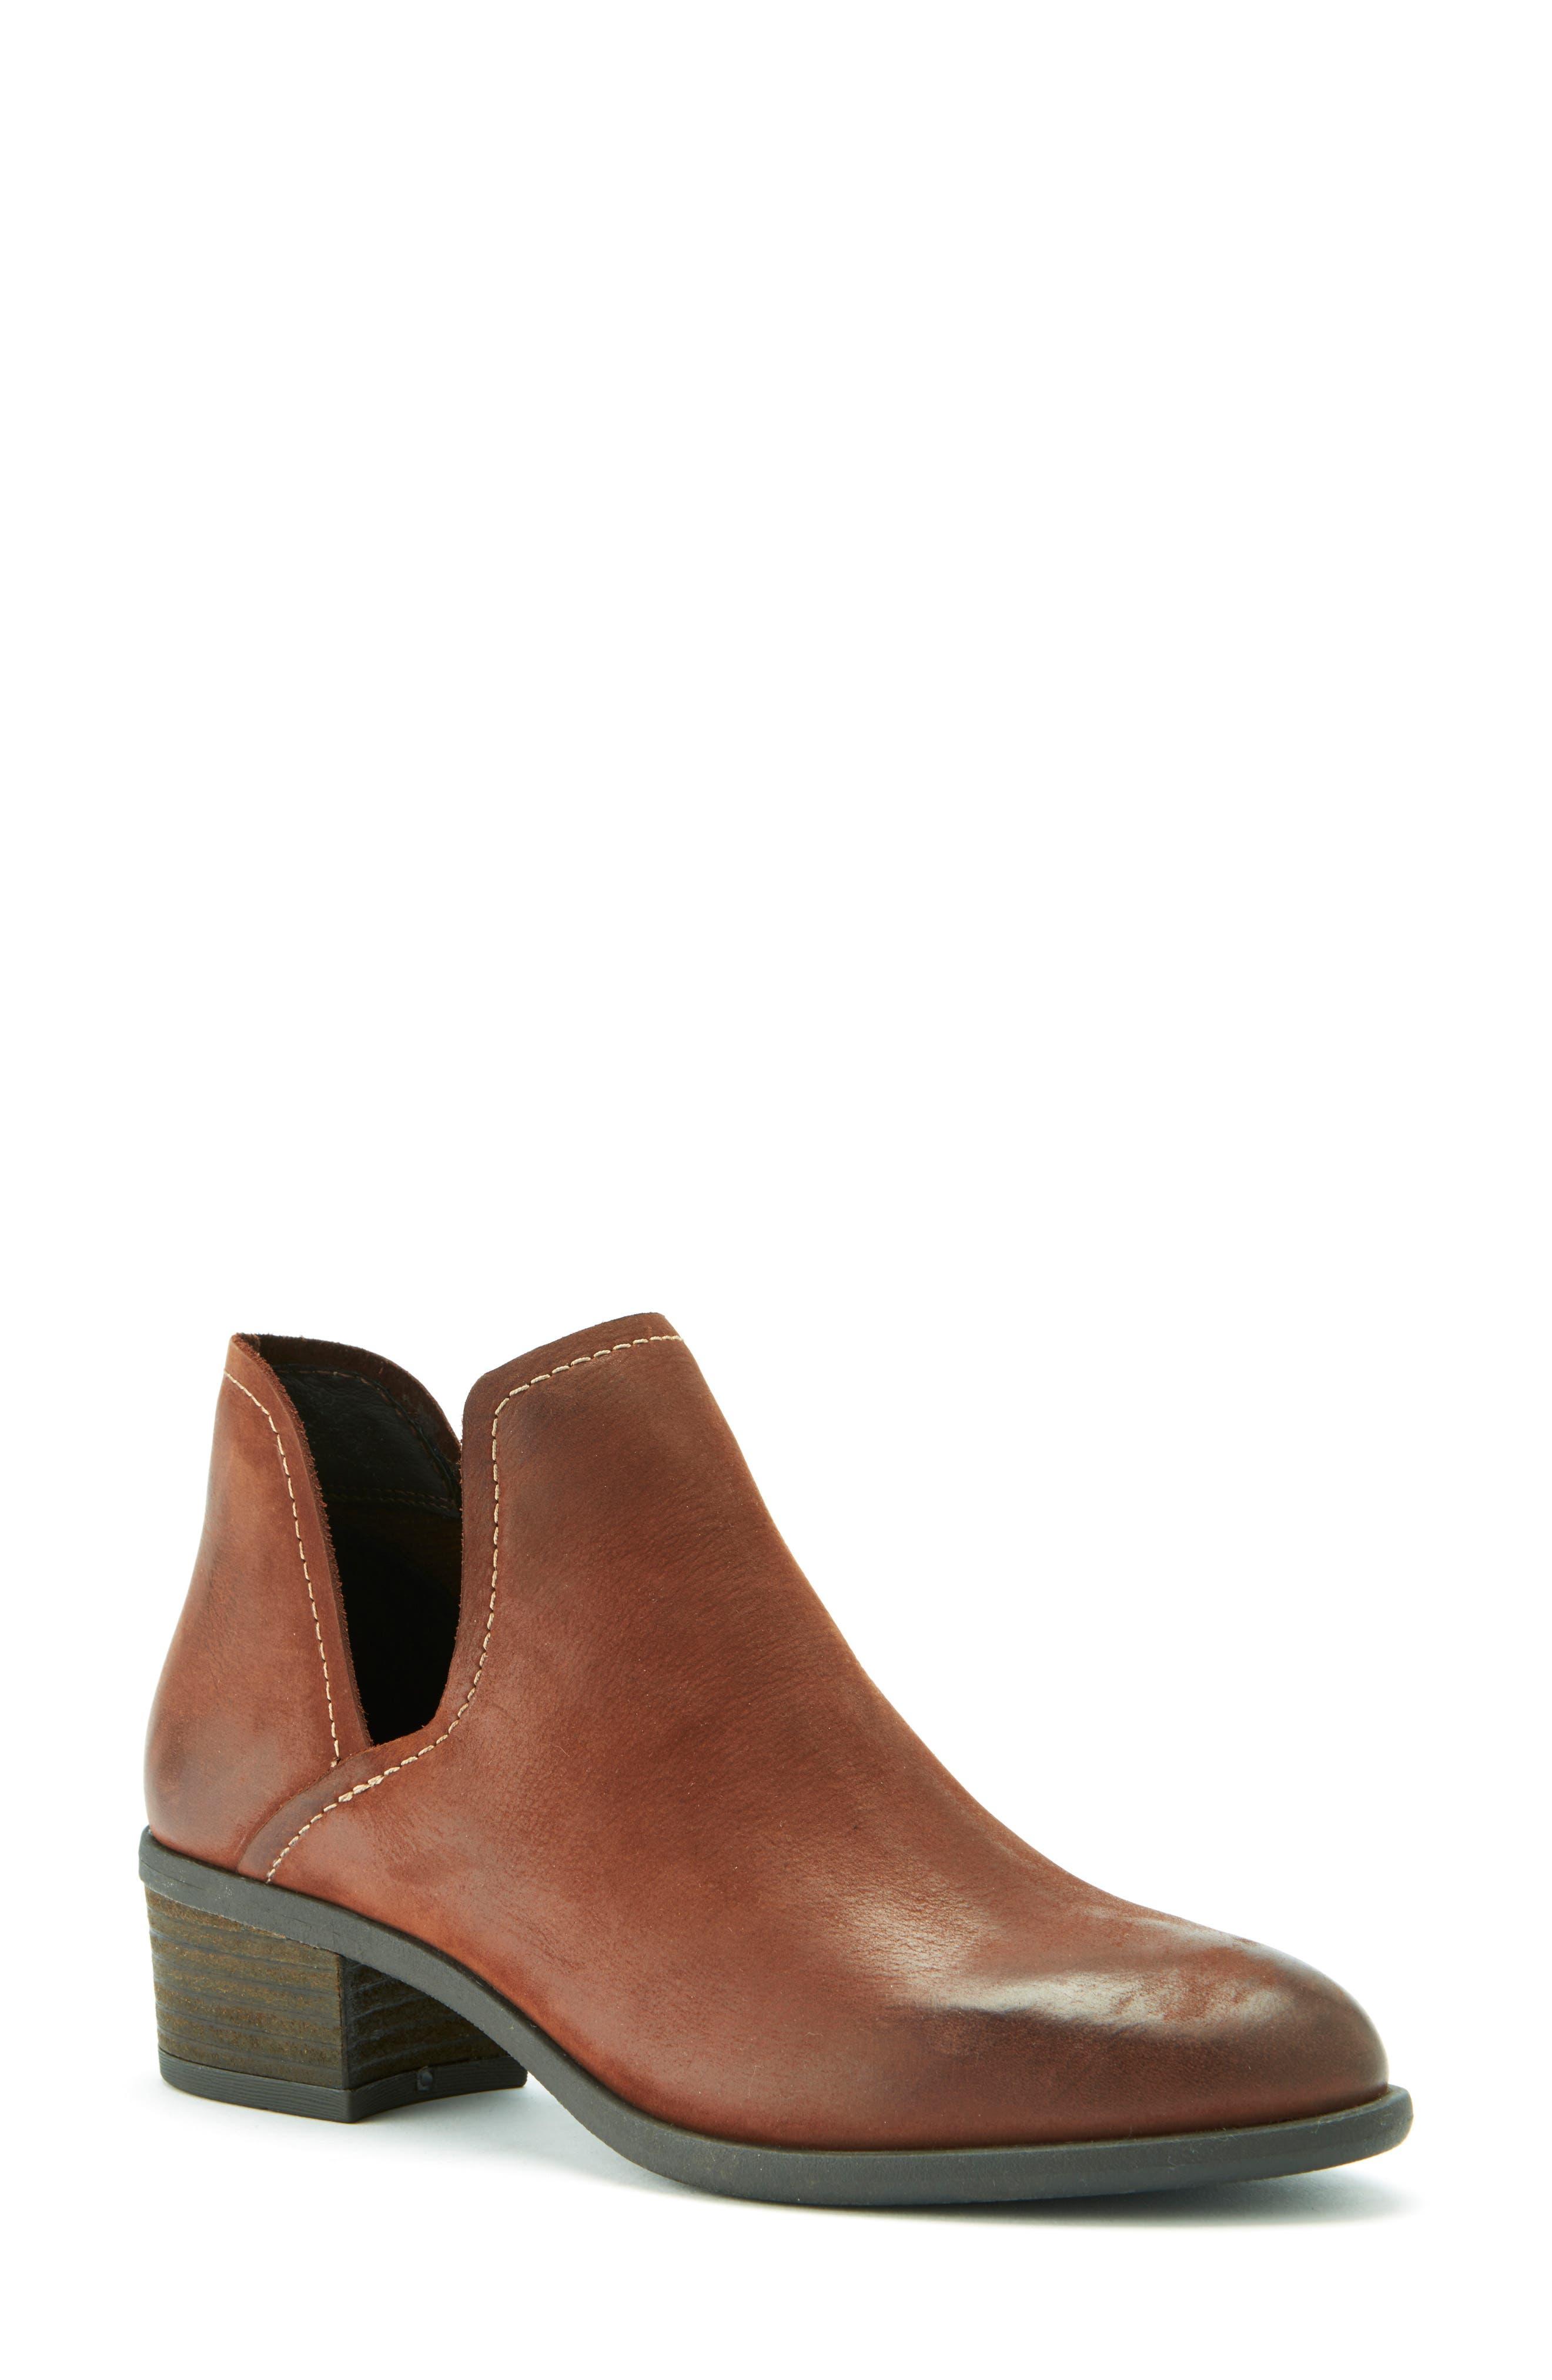 Alternate Image 1 Selected - Blondo Marla Waterproof Boot (Women)